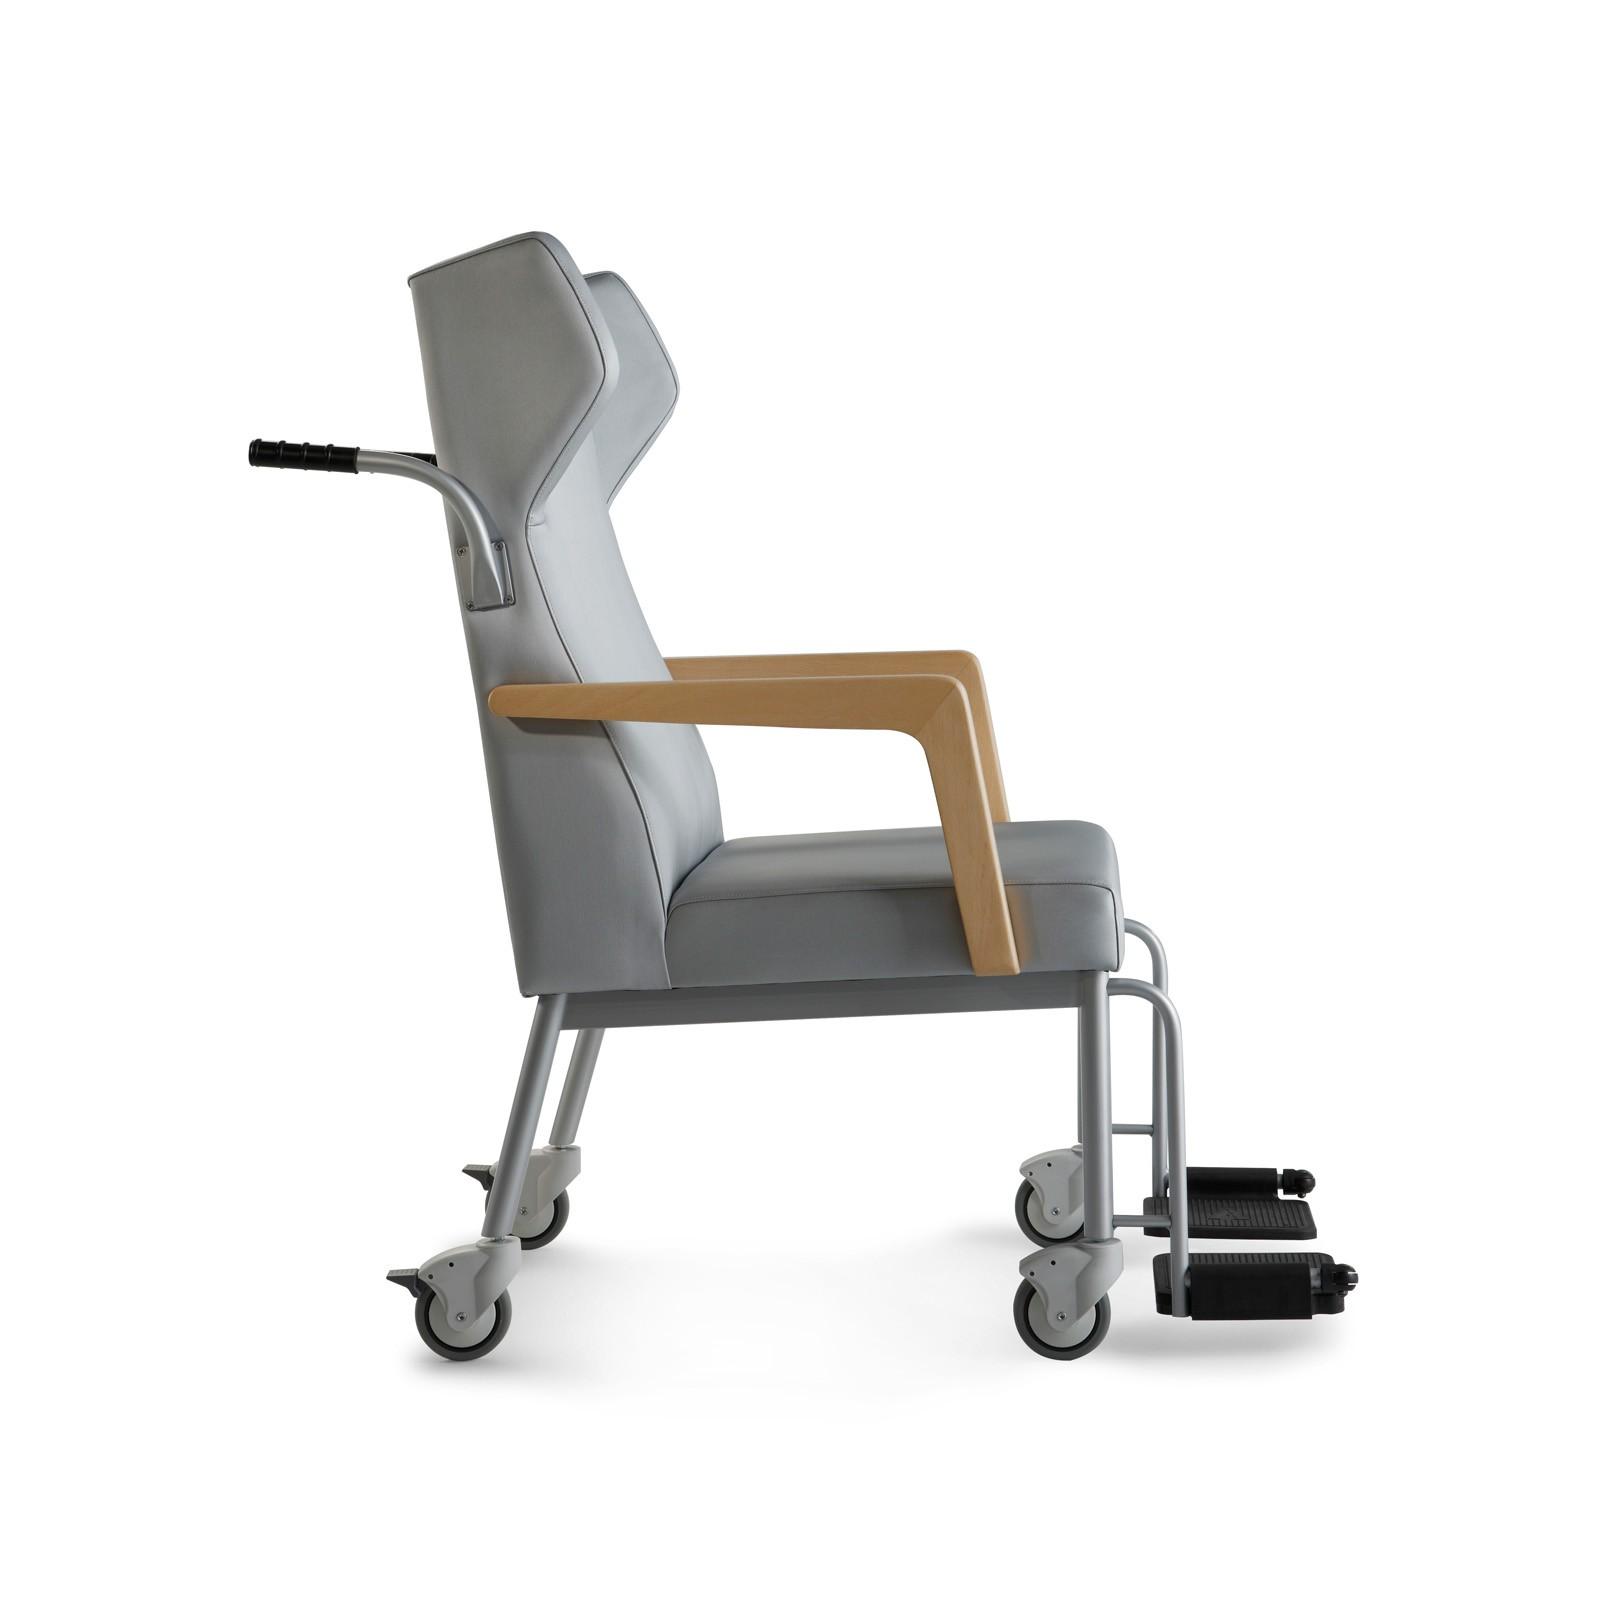 kezu_proyec_boomerang_wing_transfer-healthcare furniture